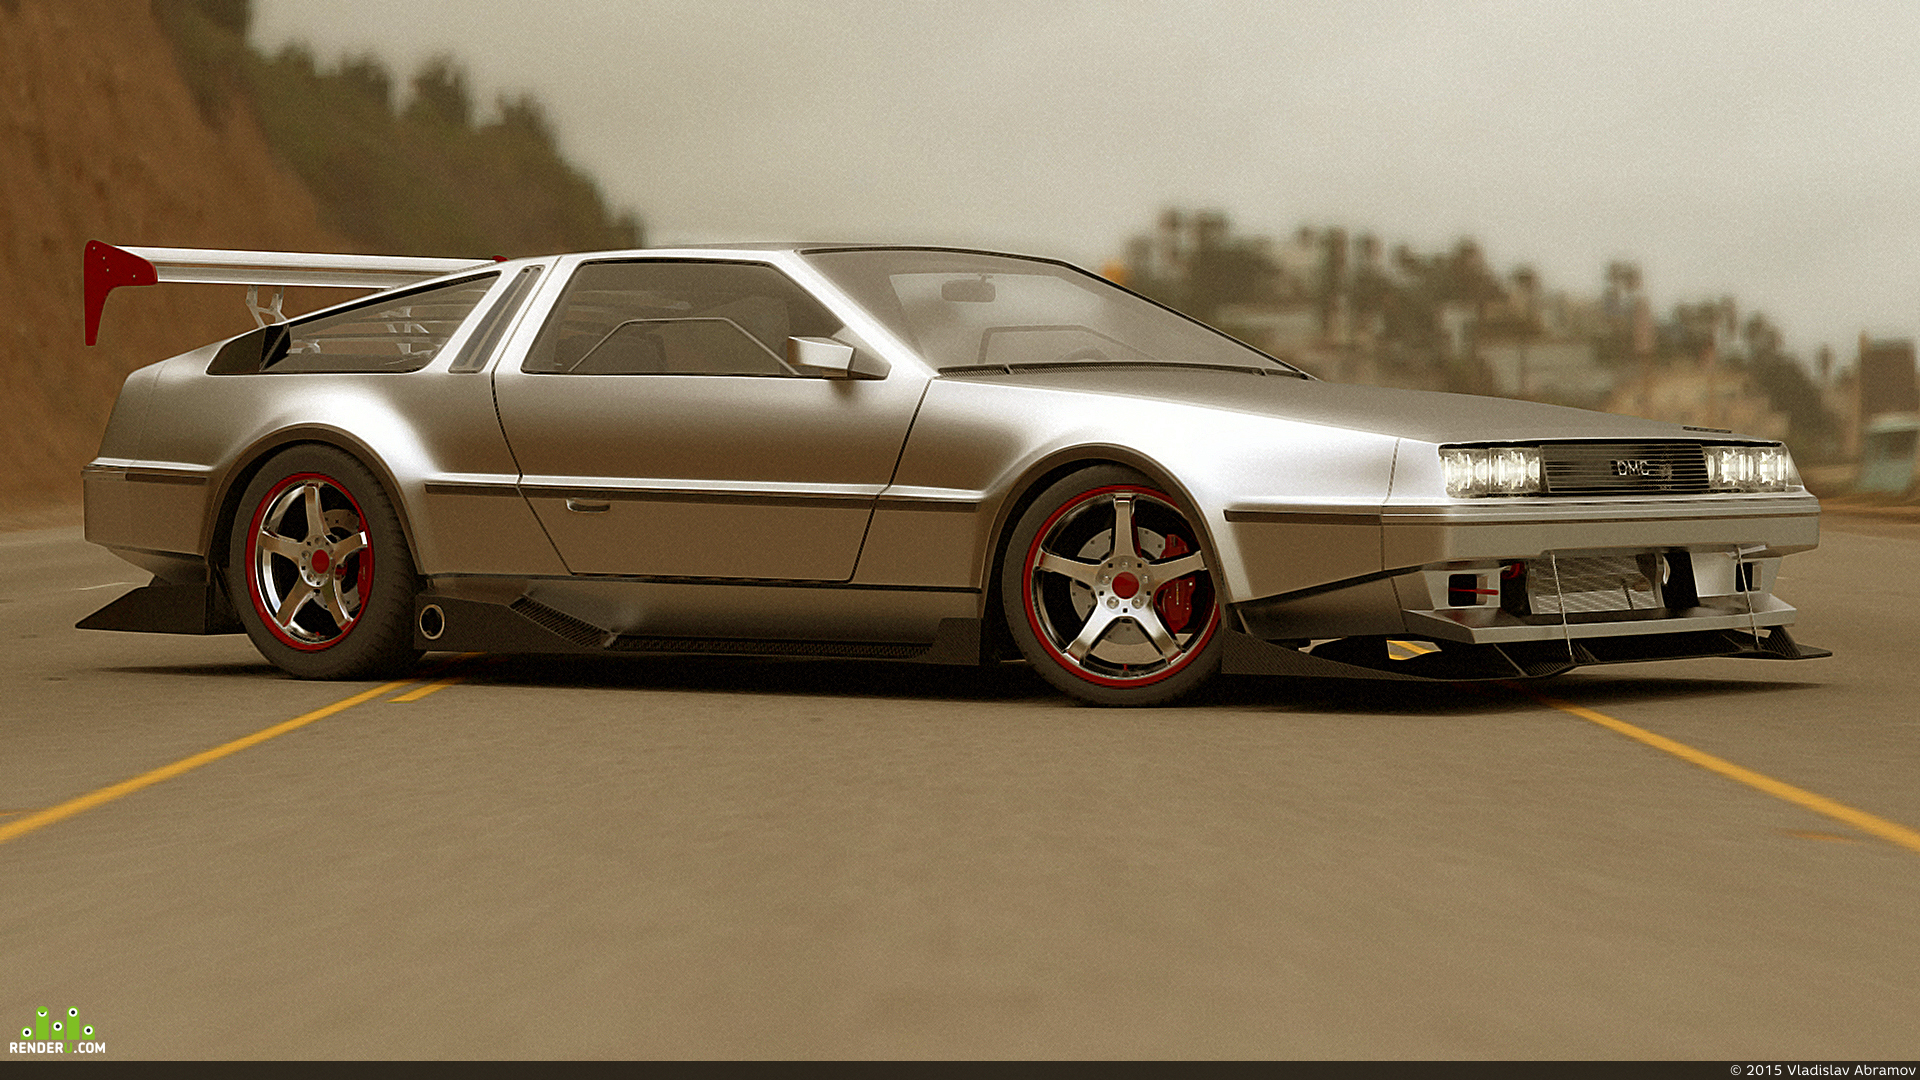 preview DMC DeLorean